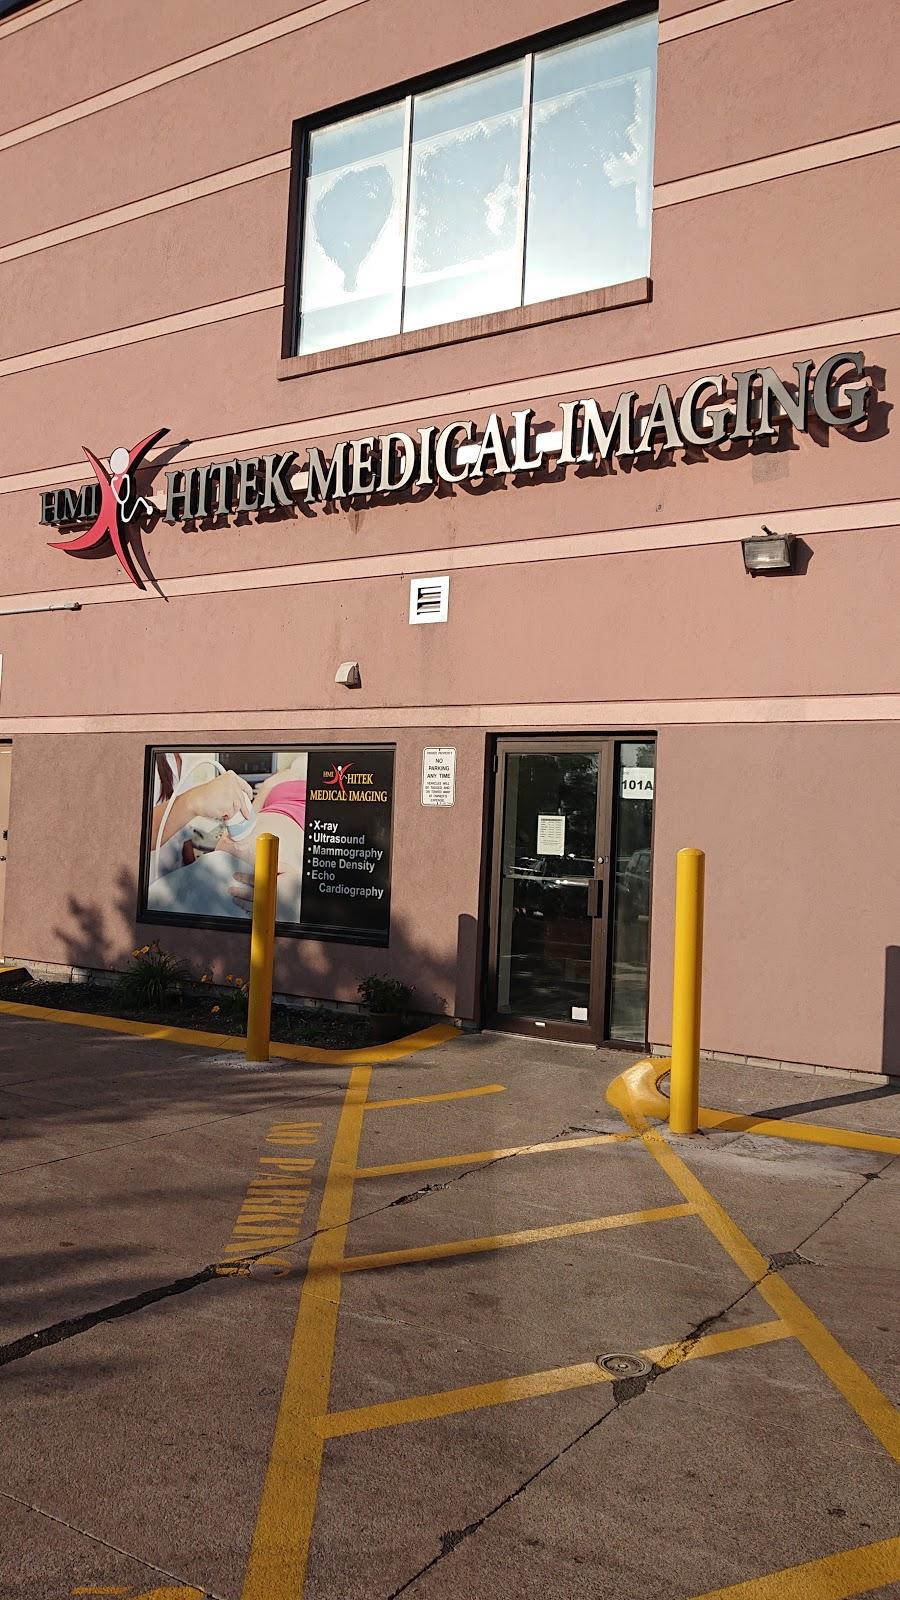 Hitek Medical Imaging | health | 6464 Yonge St #101A, North York, ON M2M 3X4, Canada | 4162226989 OR +1 416-222-6989